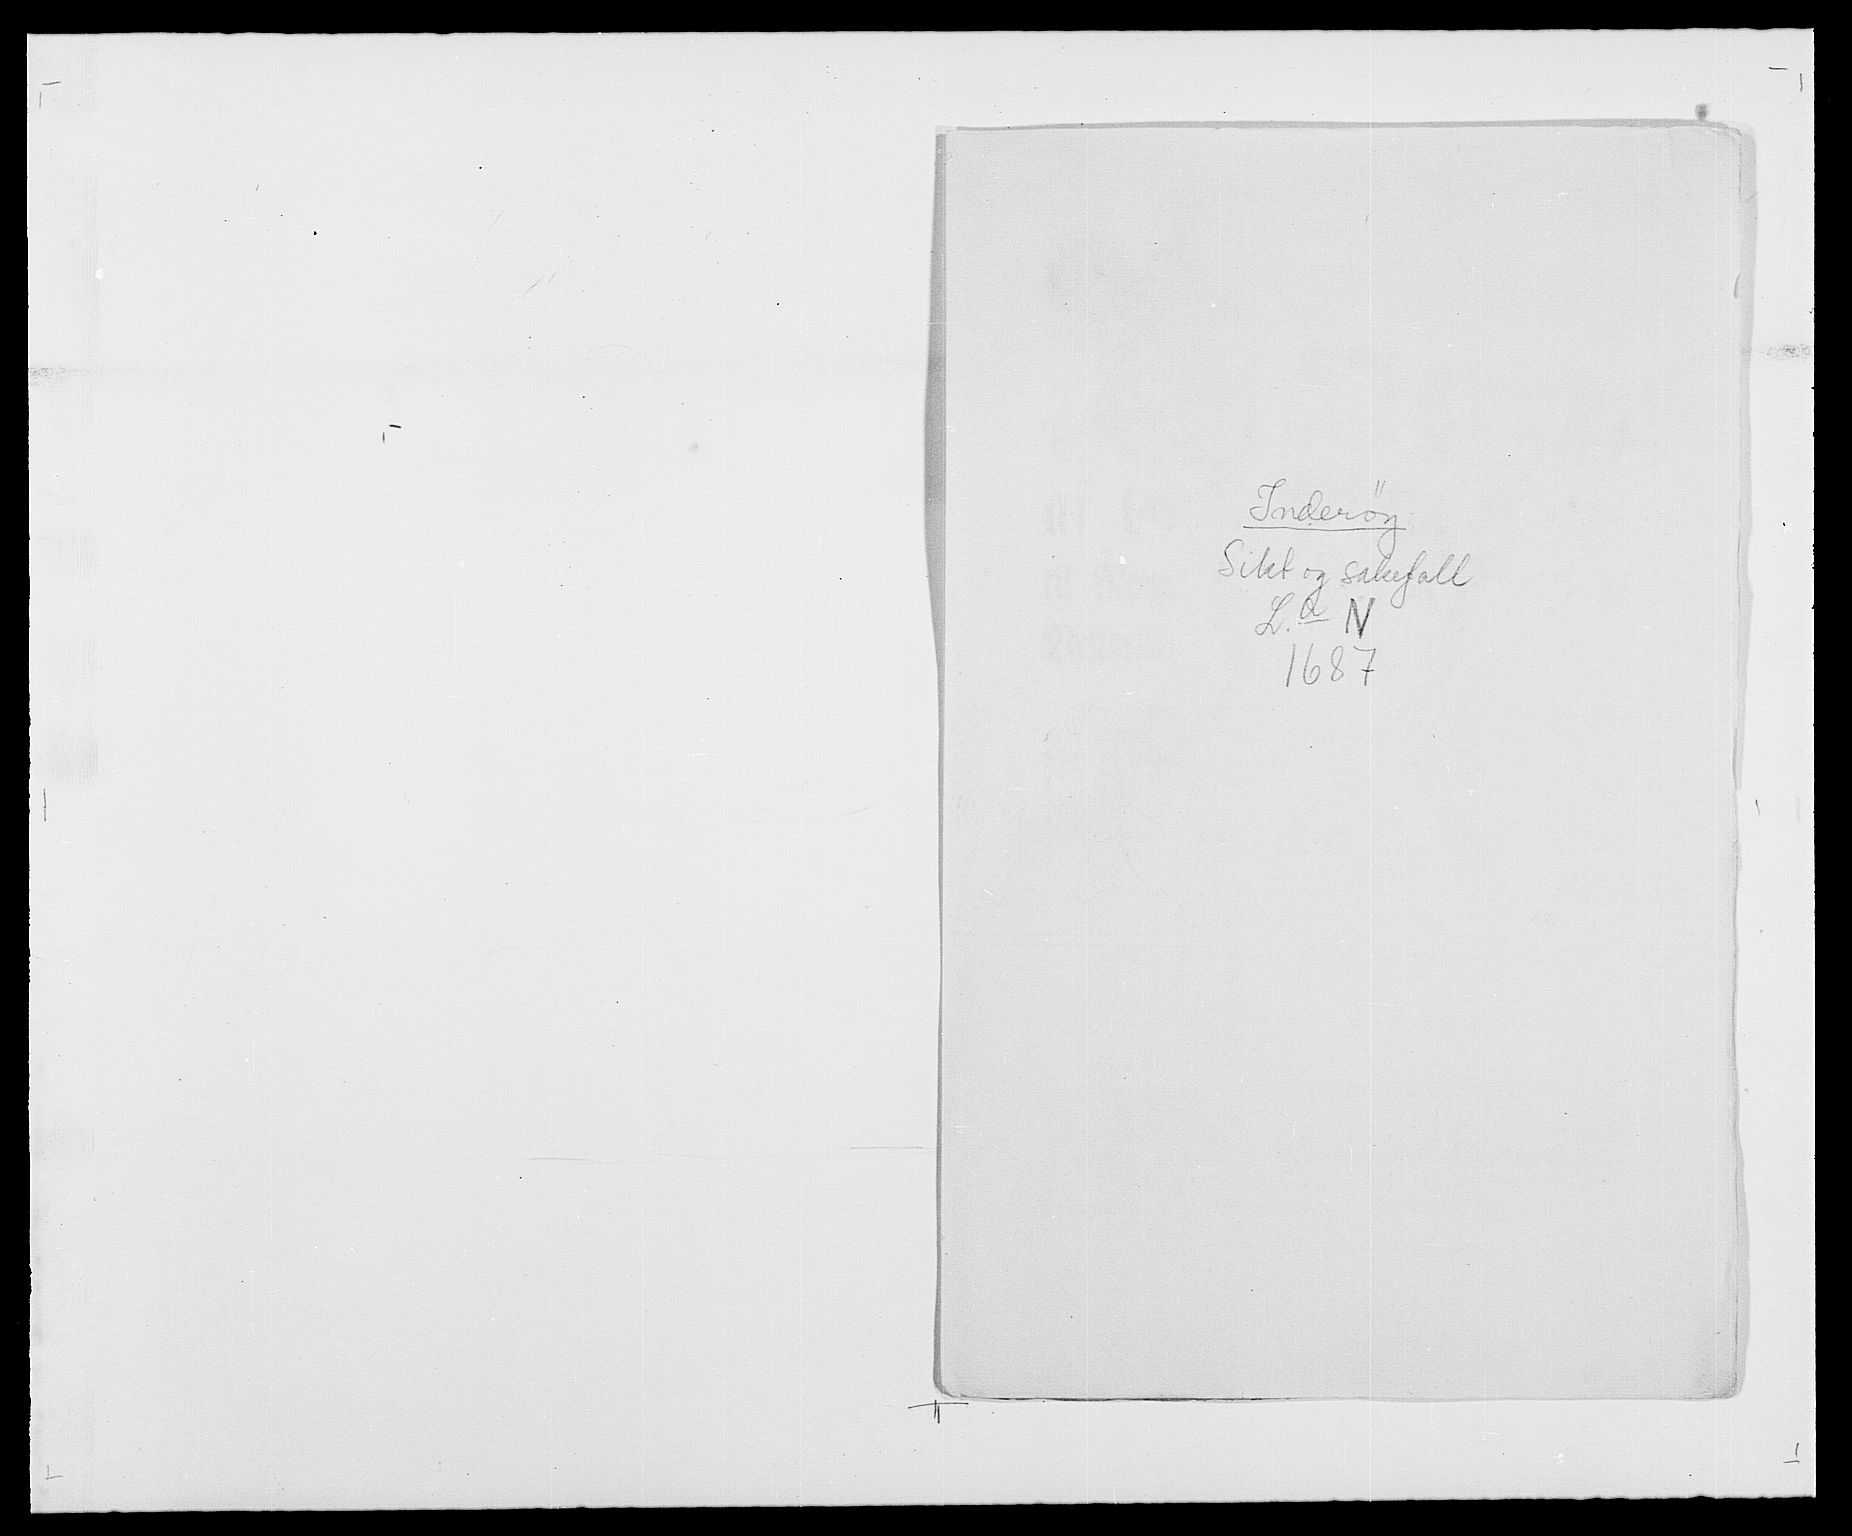 RA, Rentekammeret inntil 1814, Reviderte regnskaper, Fogderegnskap, R63/L4306: Fogderegnskap Inderøy, 1687-1689, s. 173